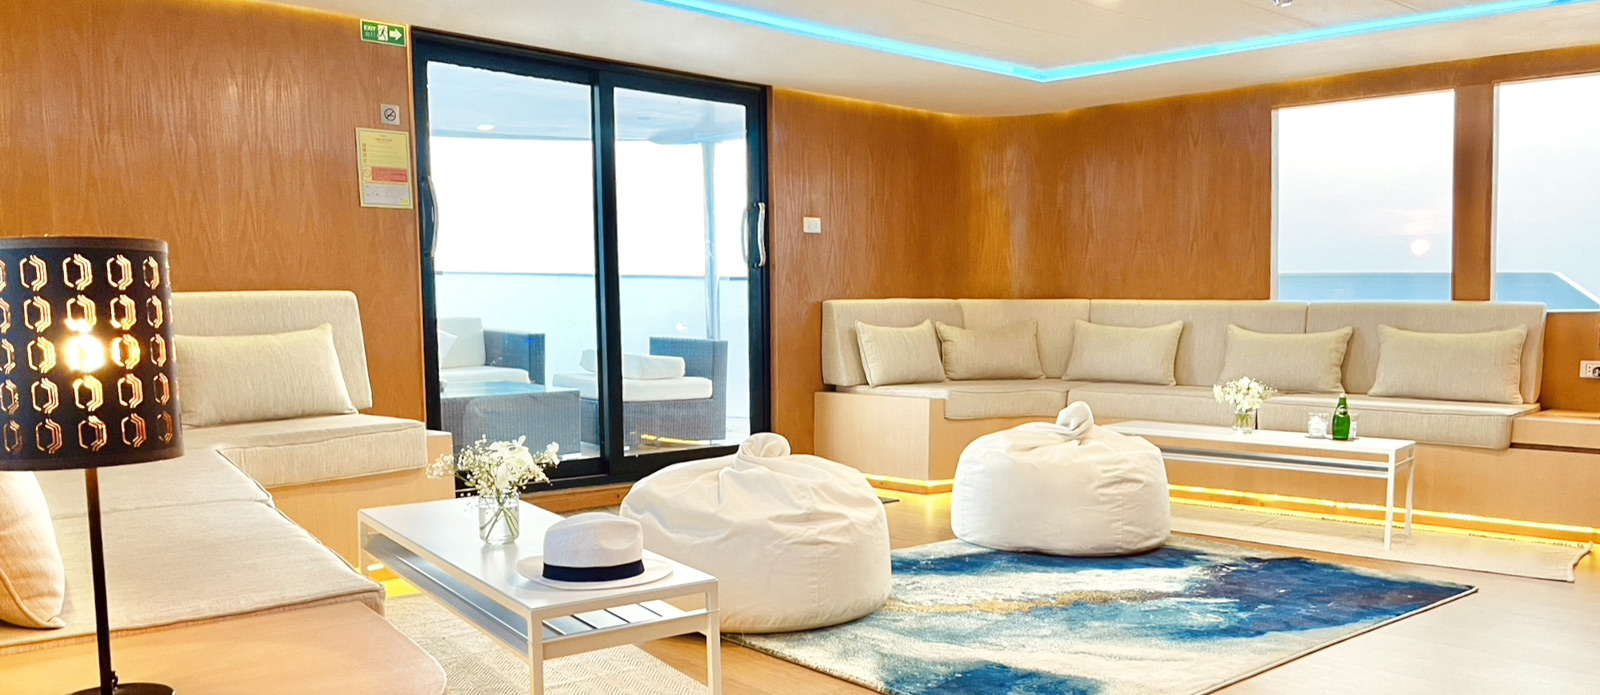 Safira-Luxury-Yacht-For-Sale-Interior-5